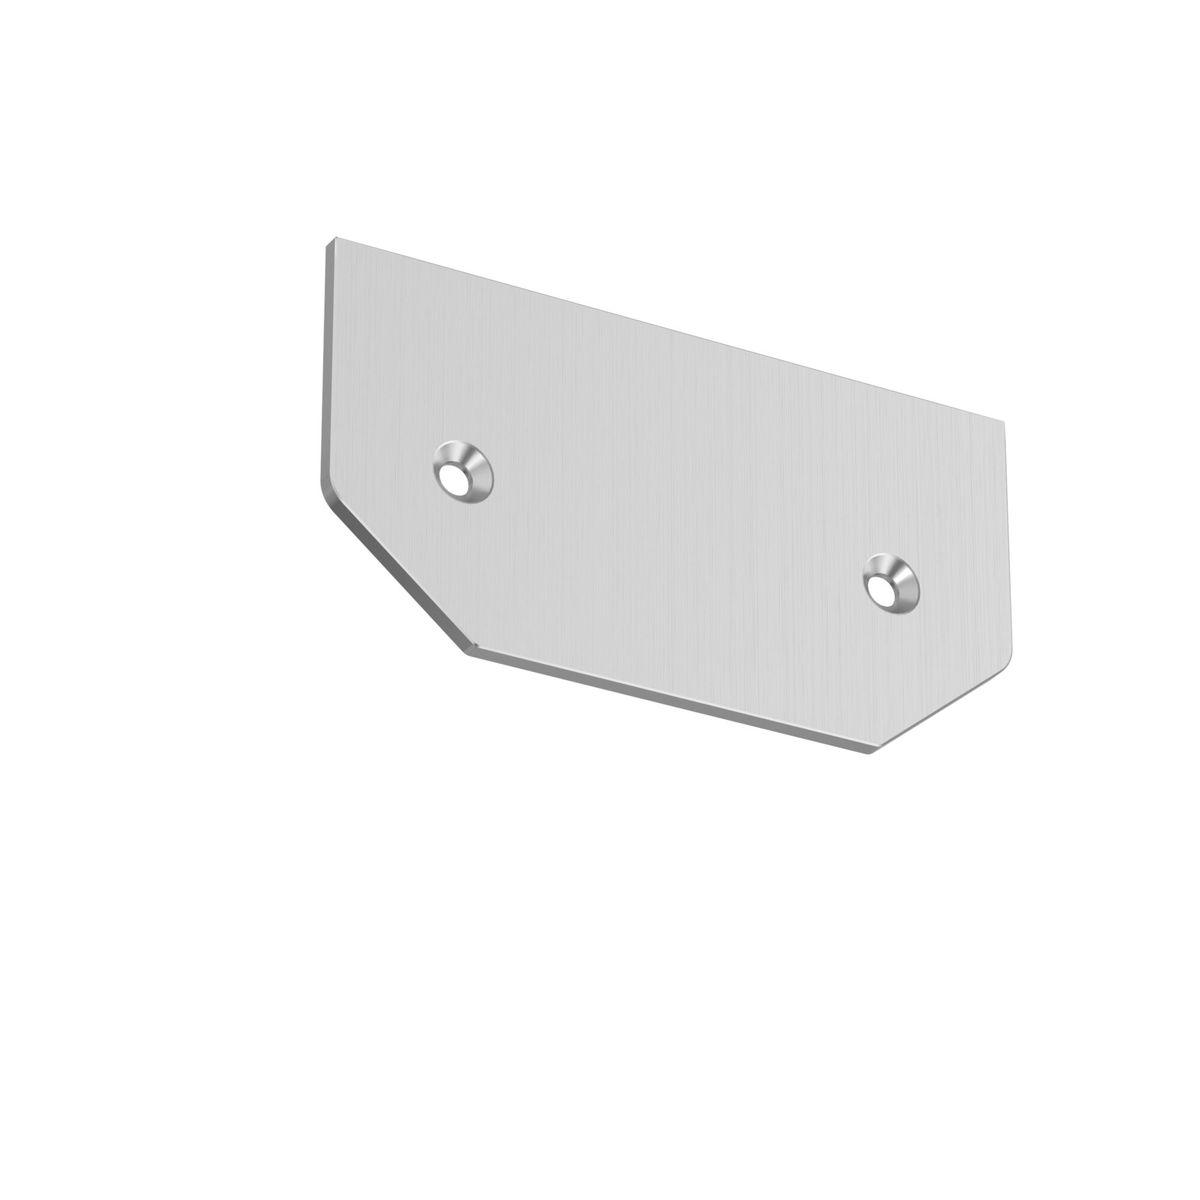 Заглушка Maytoni TRA001MPEC-11S Accessories for tracks